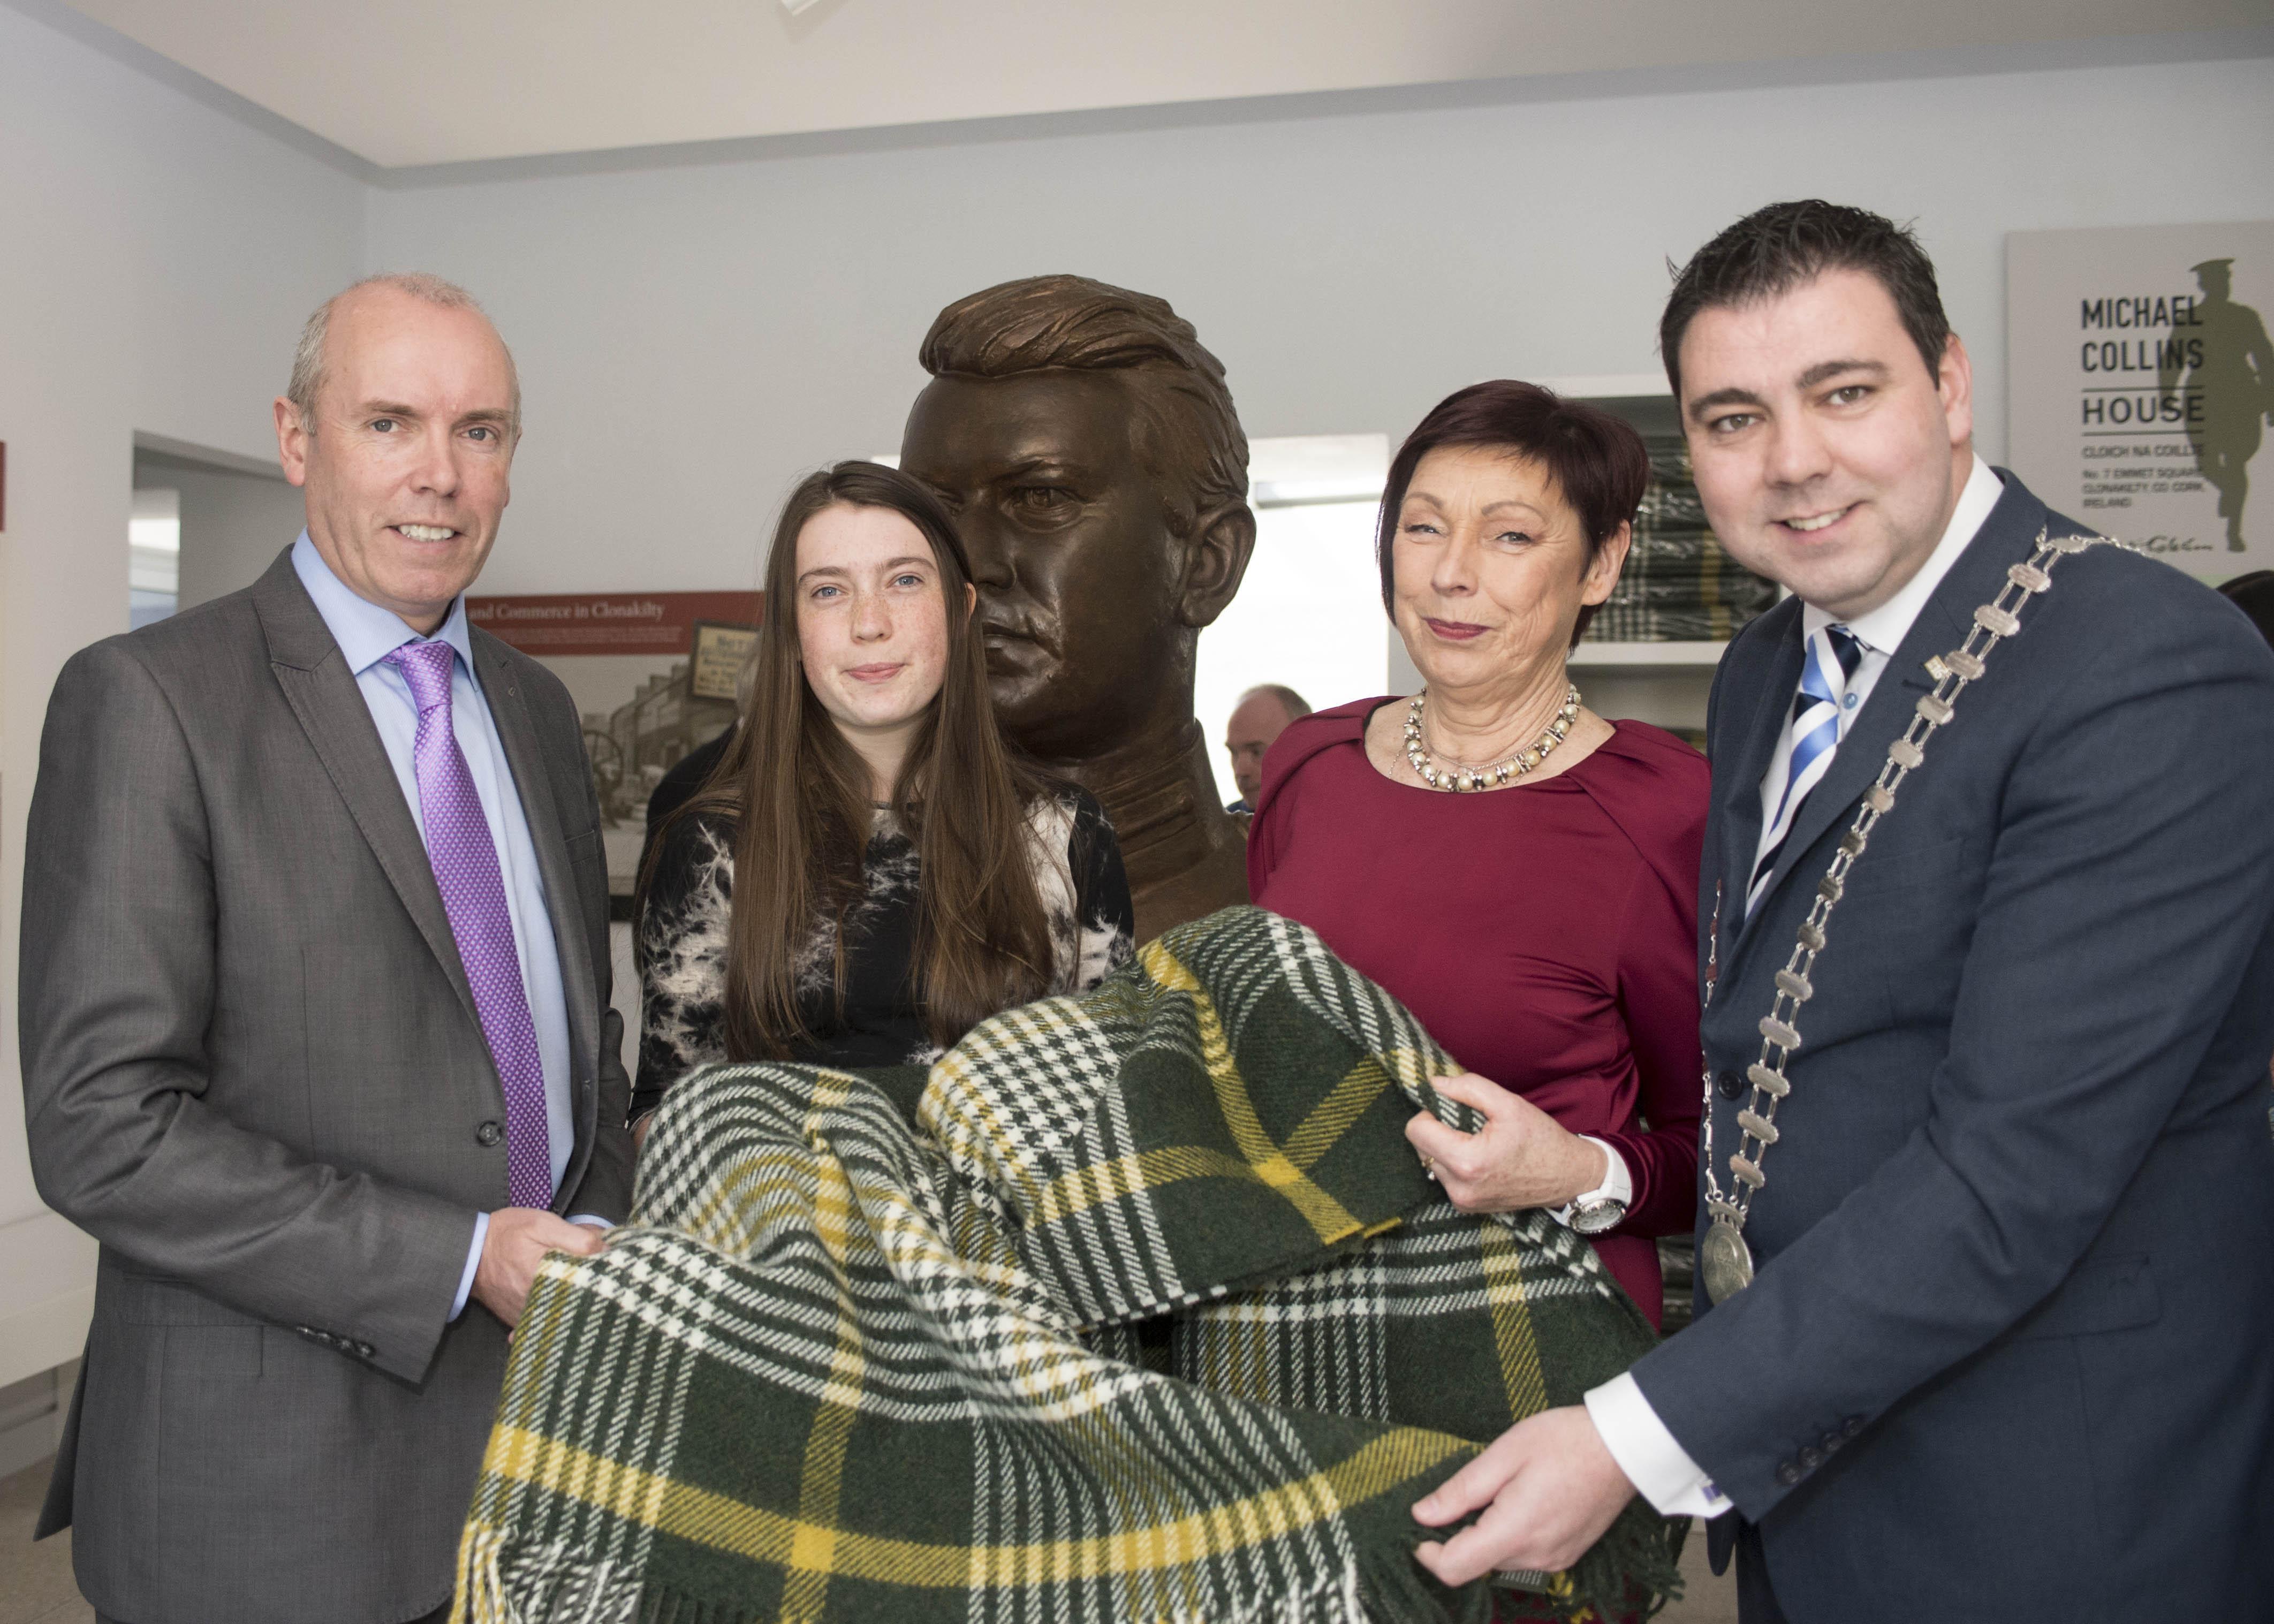 'Michael Collins House' Museum opens in Clonakilty, West Cork